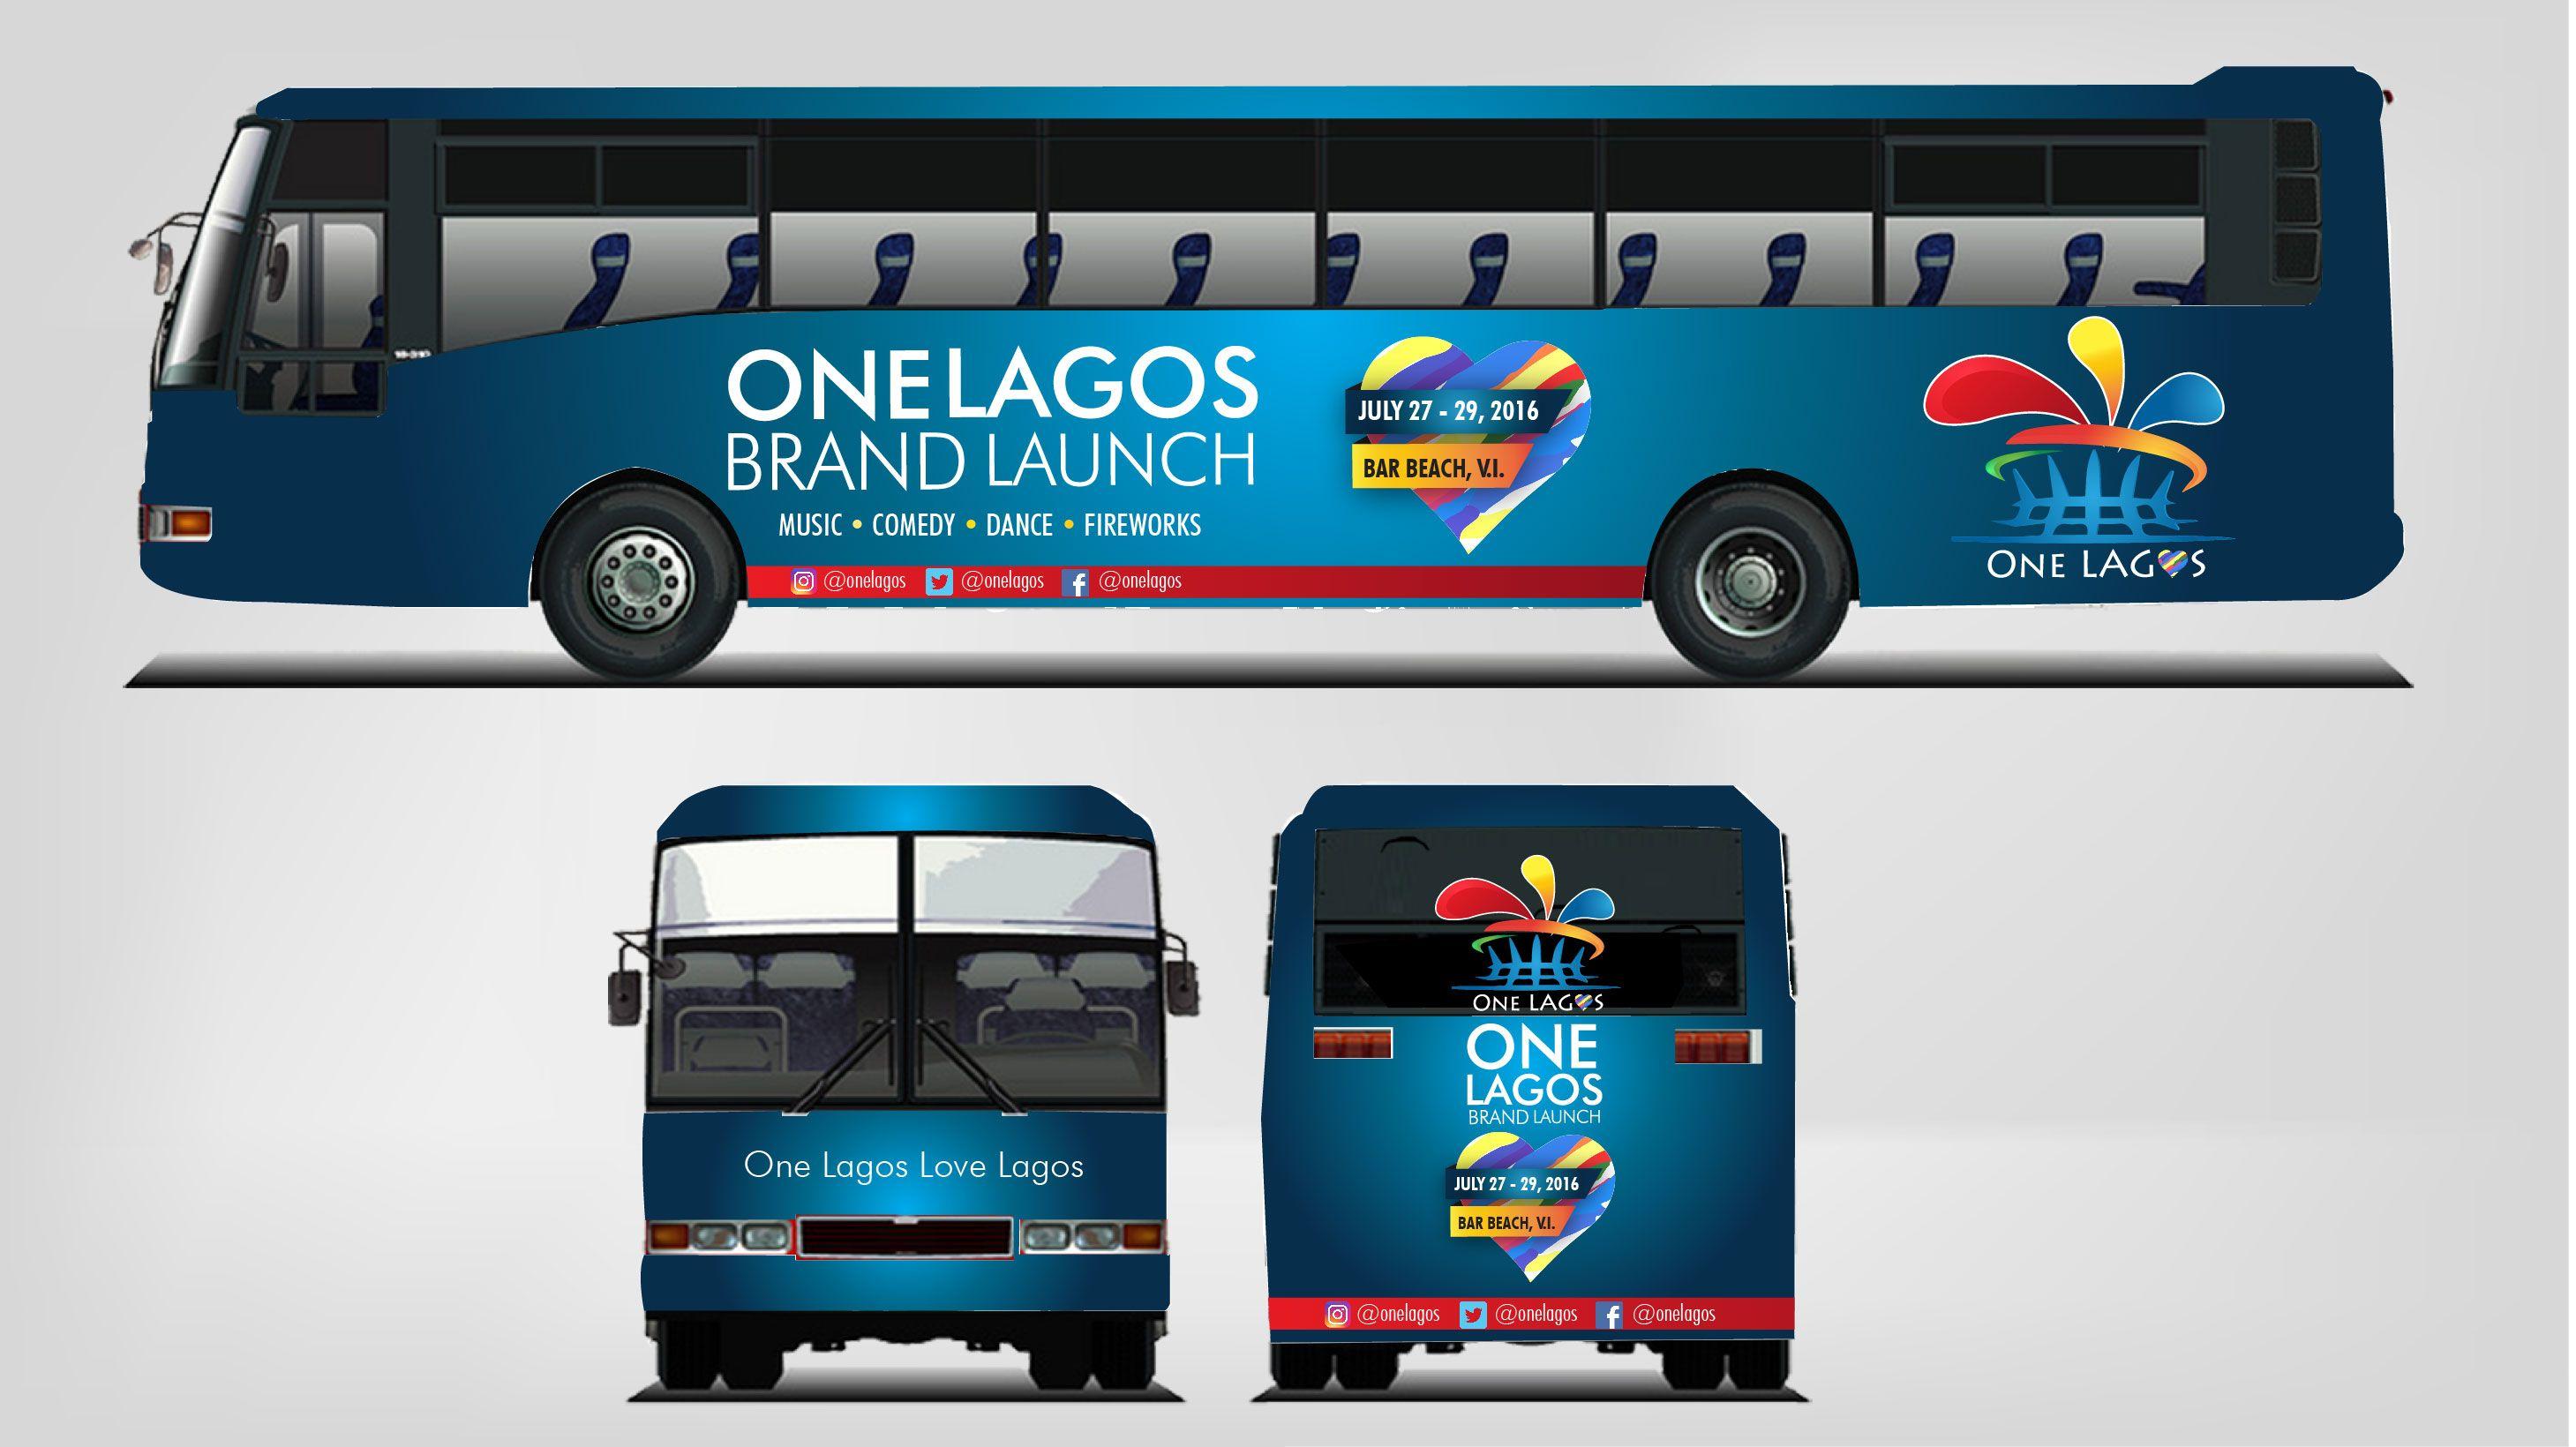 One Lagos Brt Bus Mock Up Mocking Comedy Dance Comedy